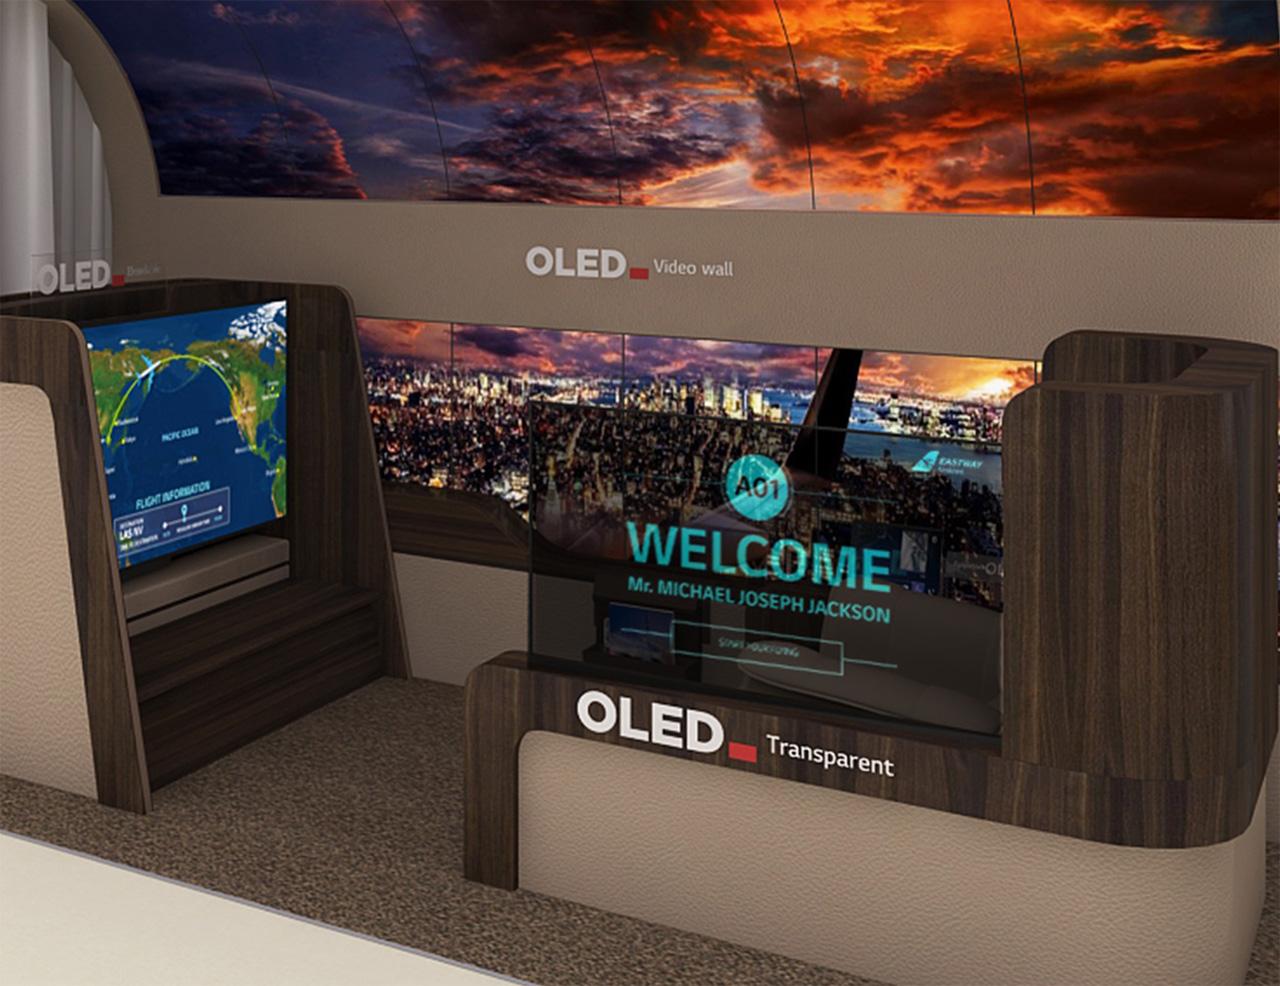 LG Display transparent OLED for plane aisles